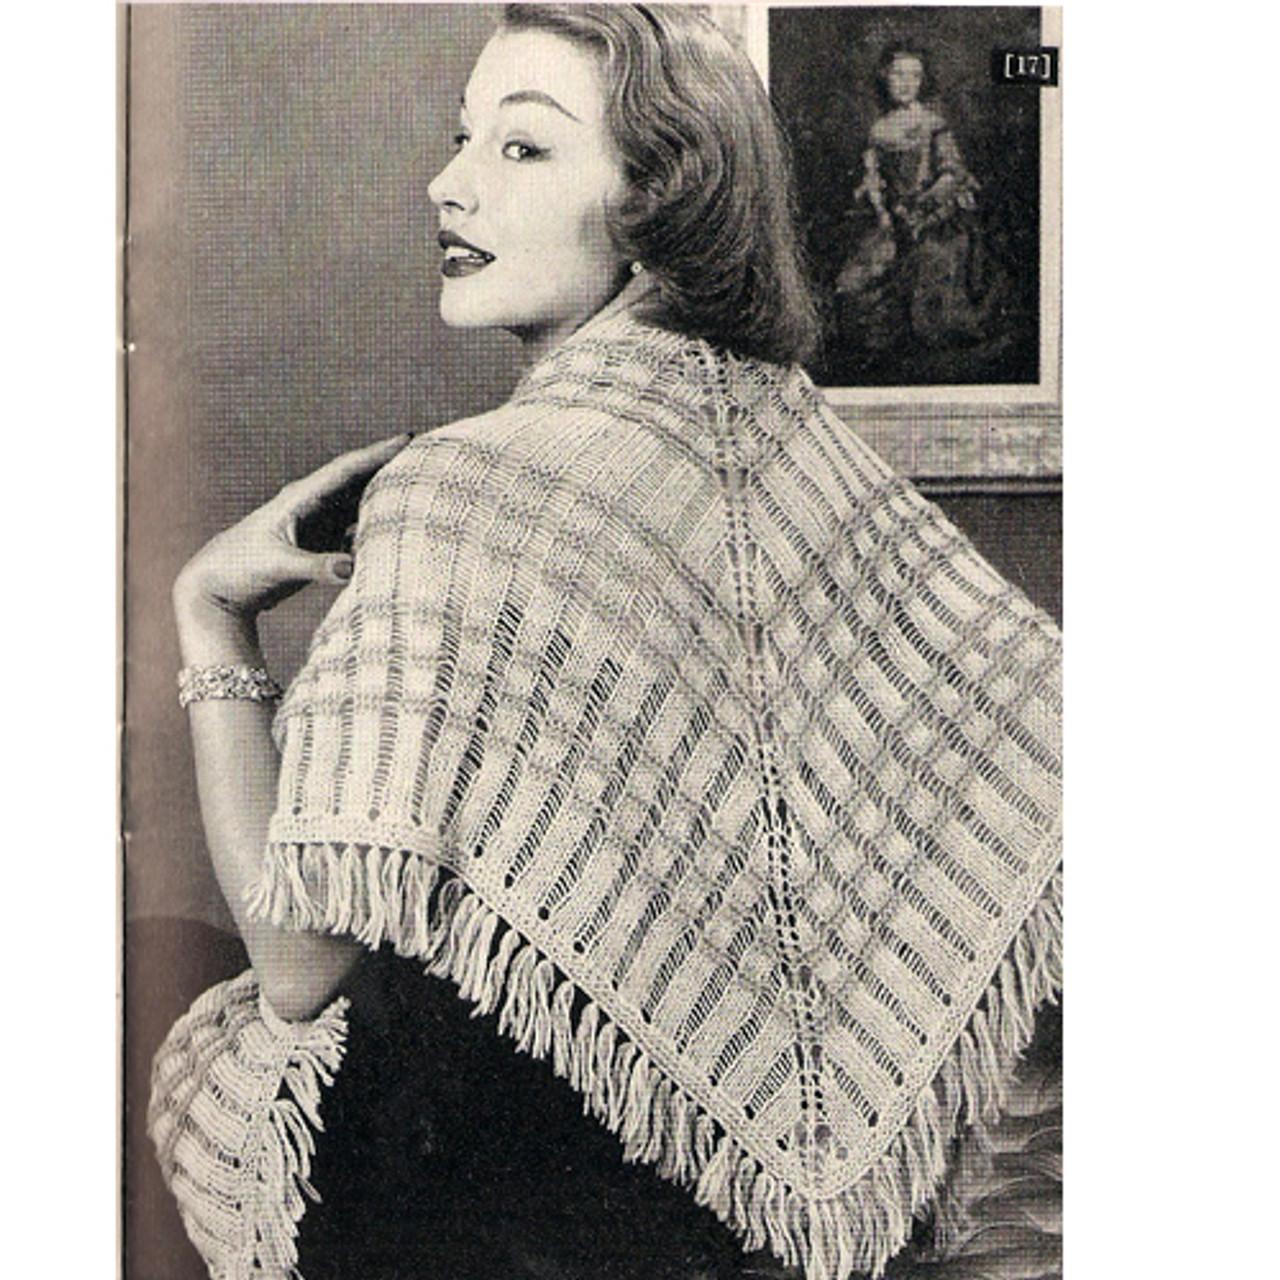 Knitted Triangular Stole Pattern, Vintage 1950s